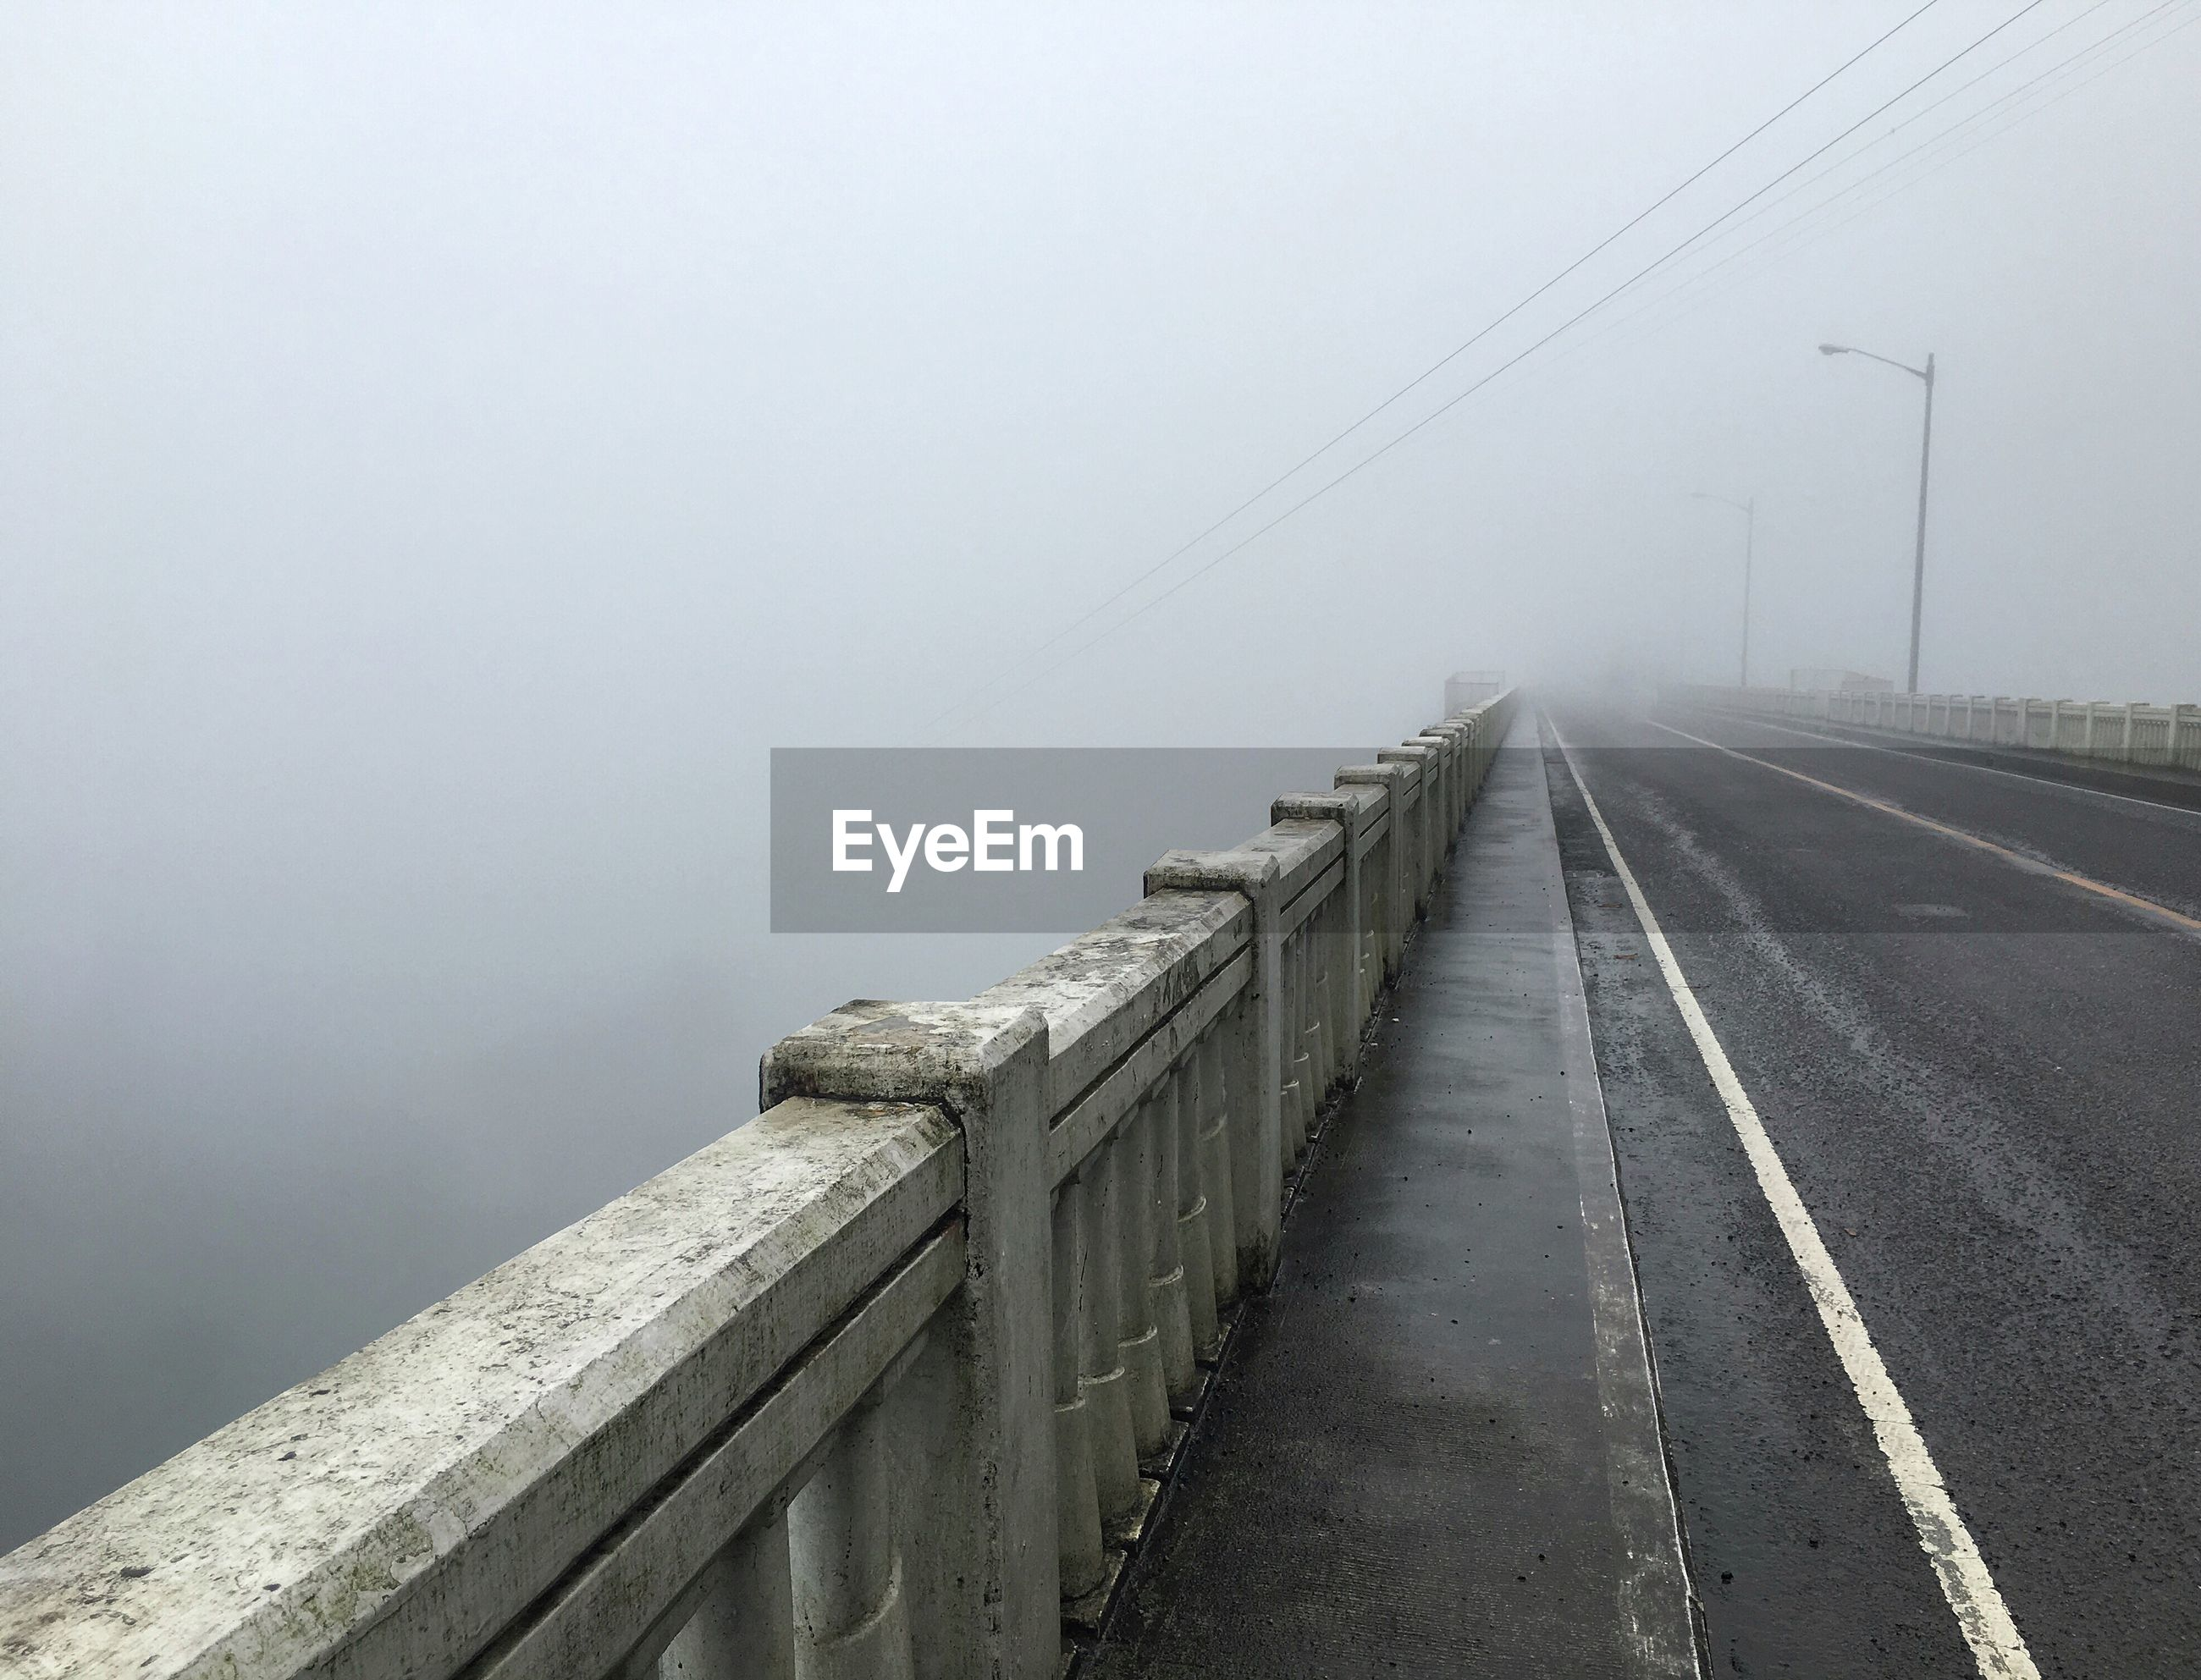 BRIDGE OVER FOGGY WEATHER AGAINST SKY